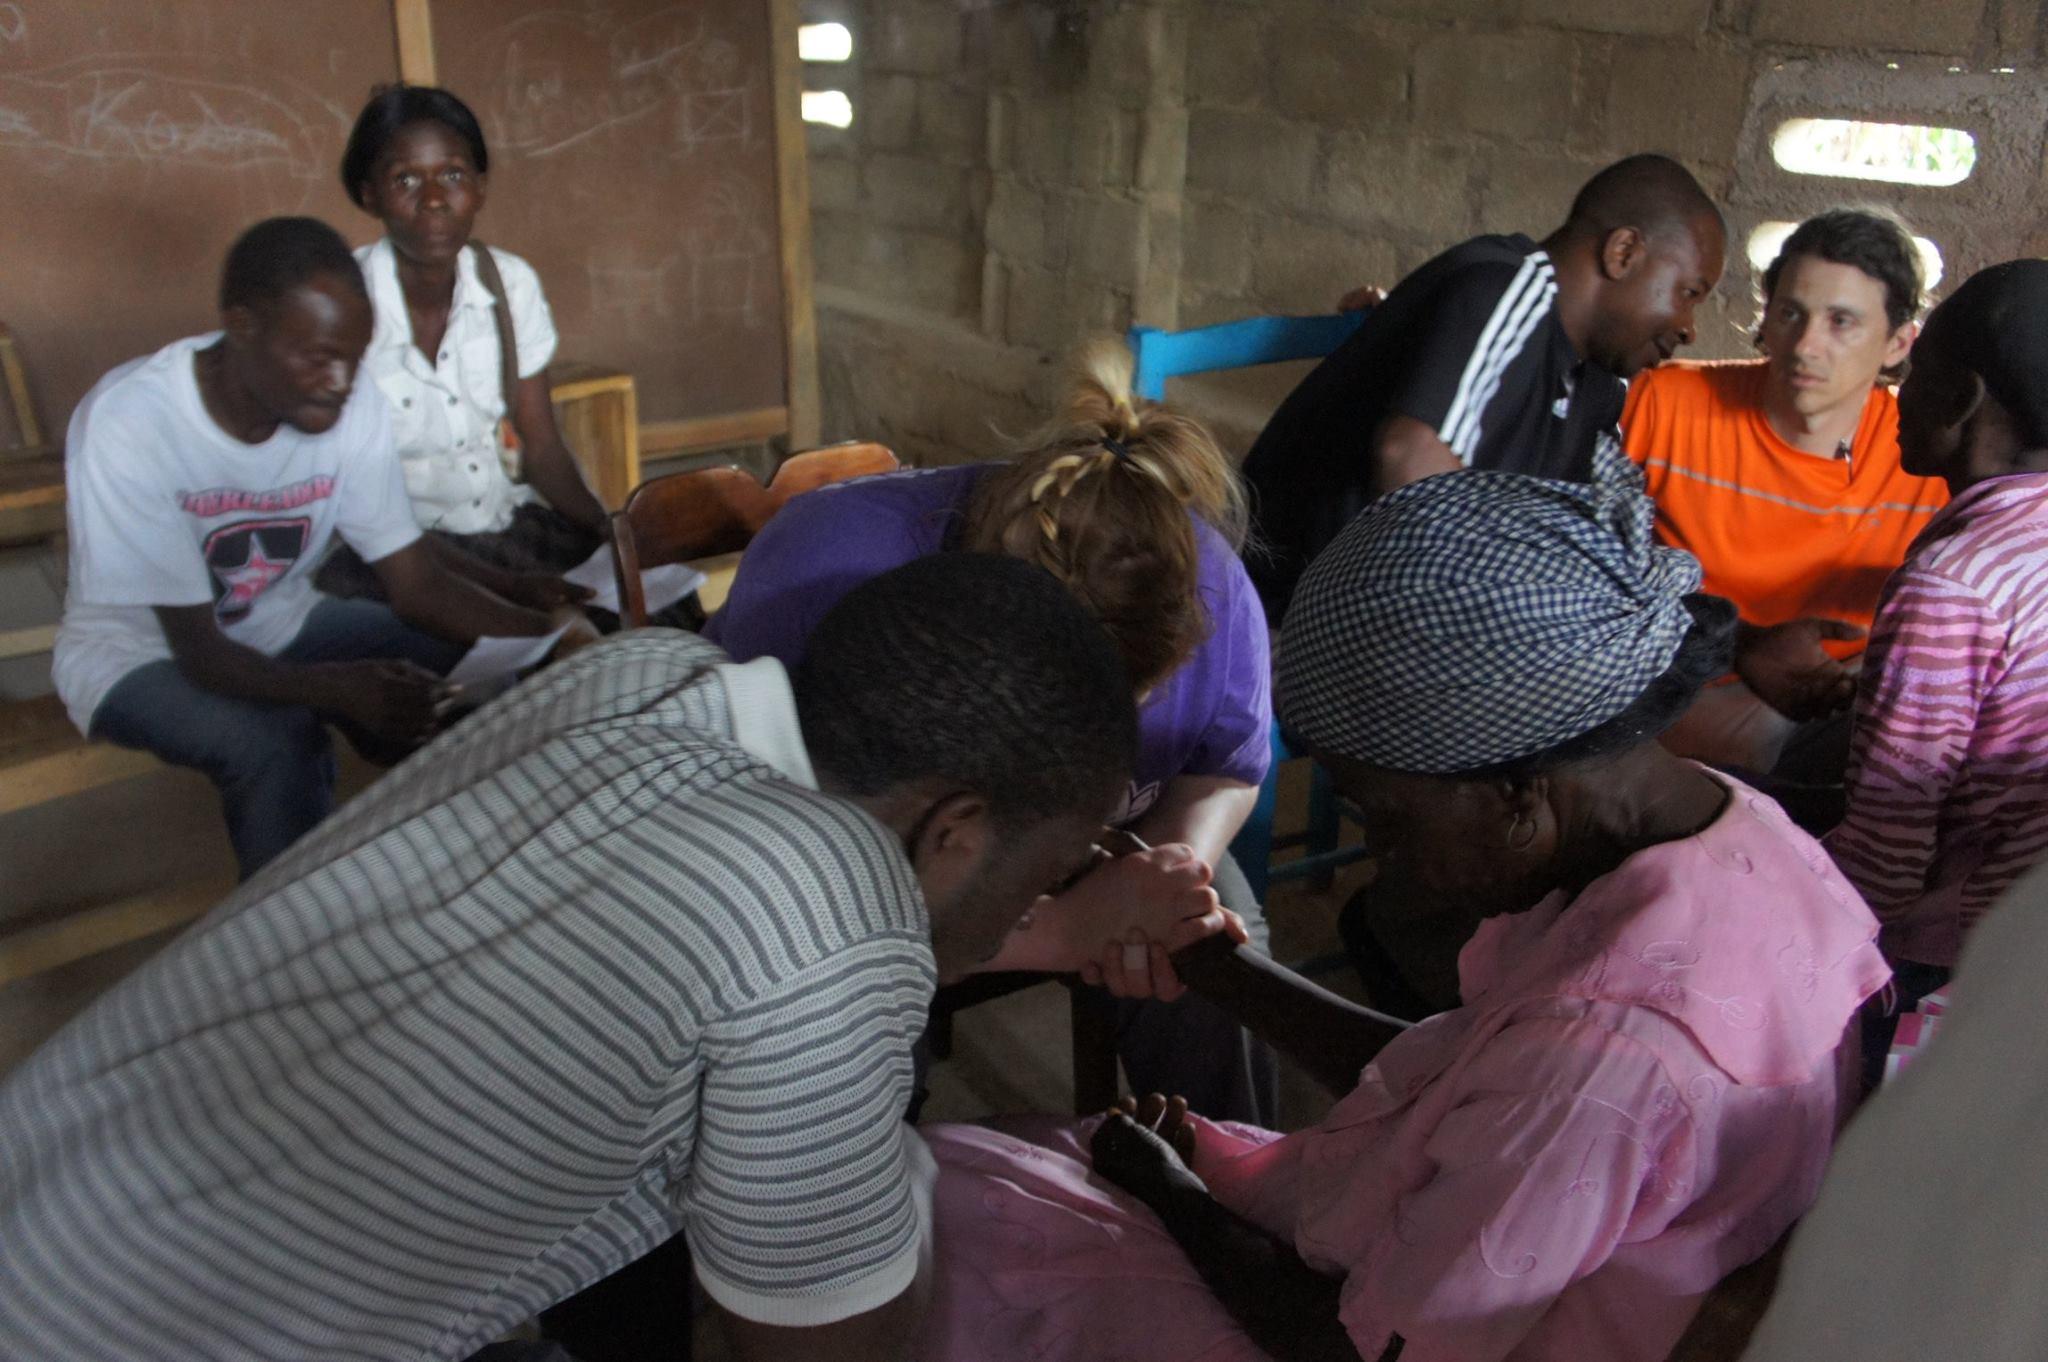 Bethesda evangelism medical clinic testimony haiti 4-17 b.jpg